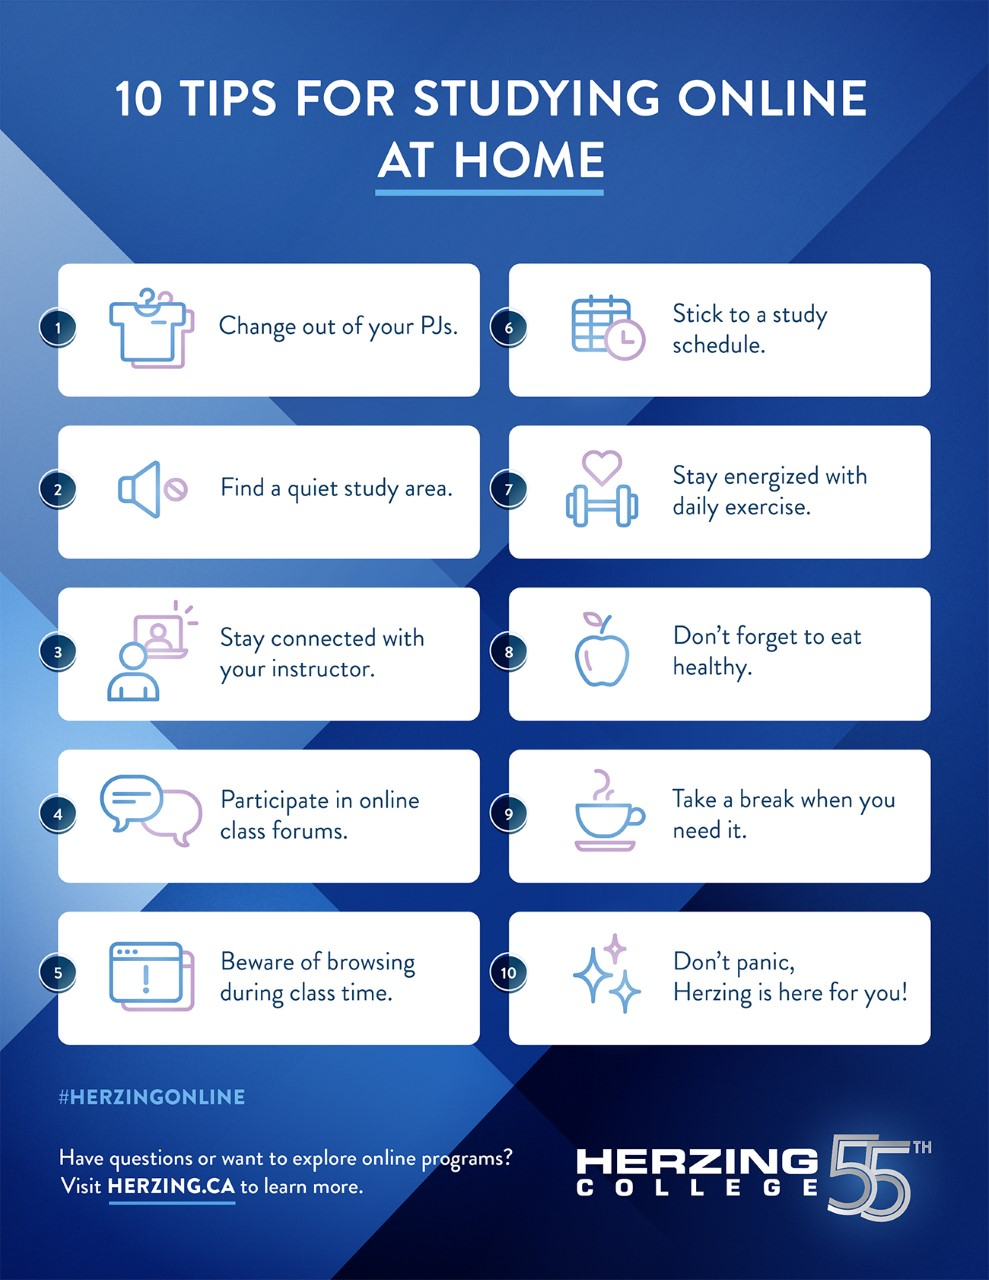 Online study tips blog post lead image